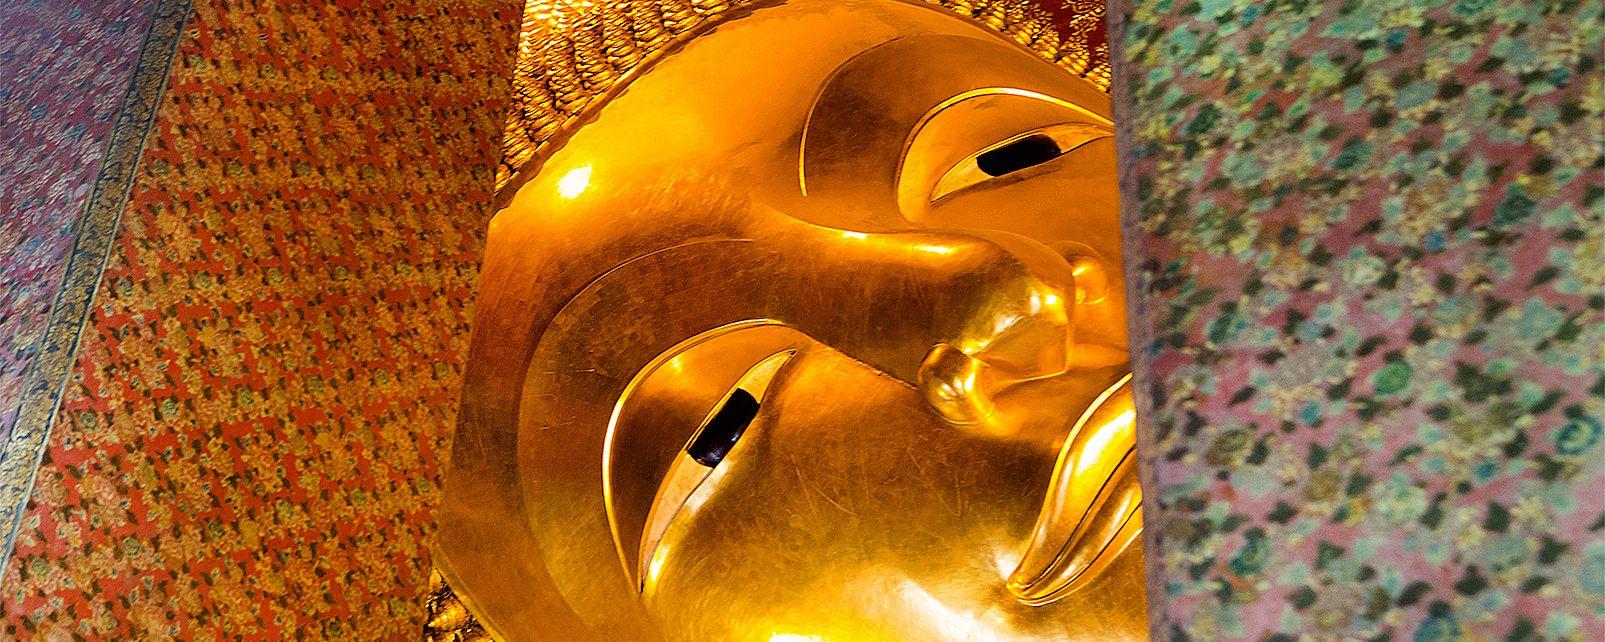 Il Buddha disteso, Il Buddha disteso - Bangkok, I monumenti, Bangkok, Thailandia